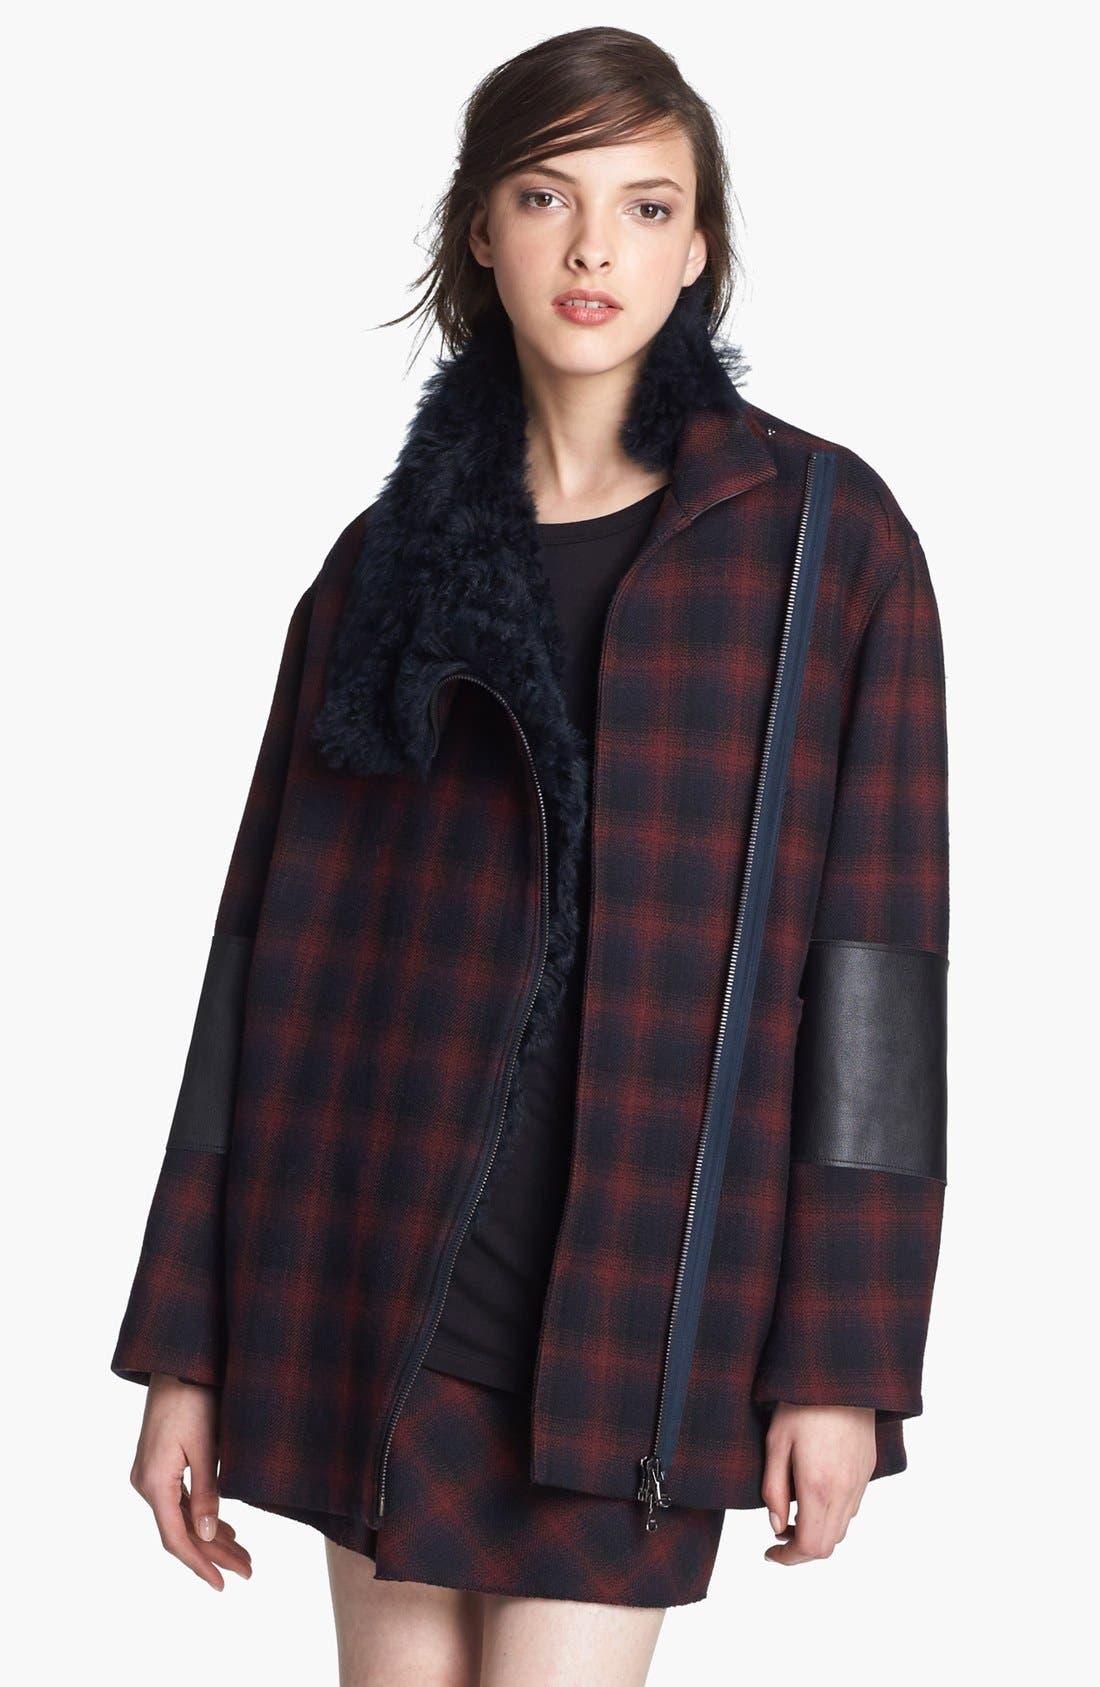 Main Image - 3.1 Phillip Lim Plaid Jacket with Genuine Lamb Fur Trim